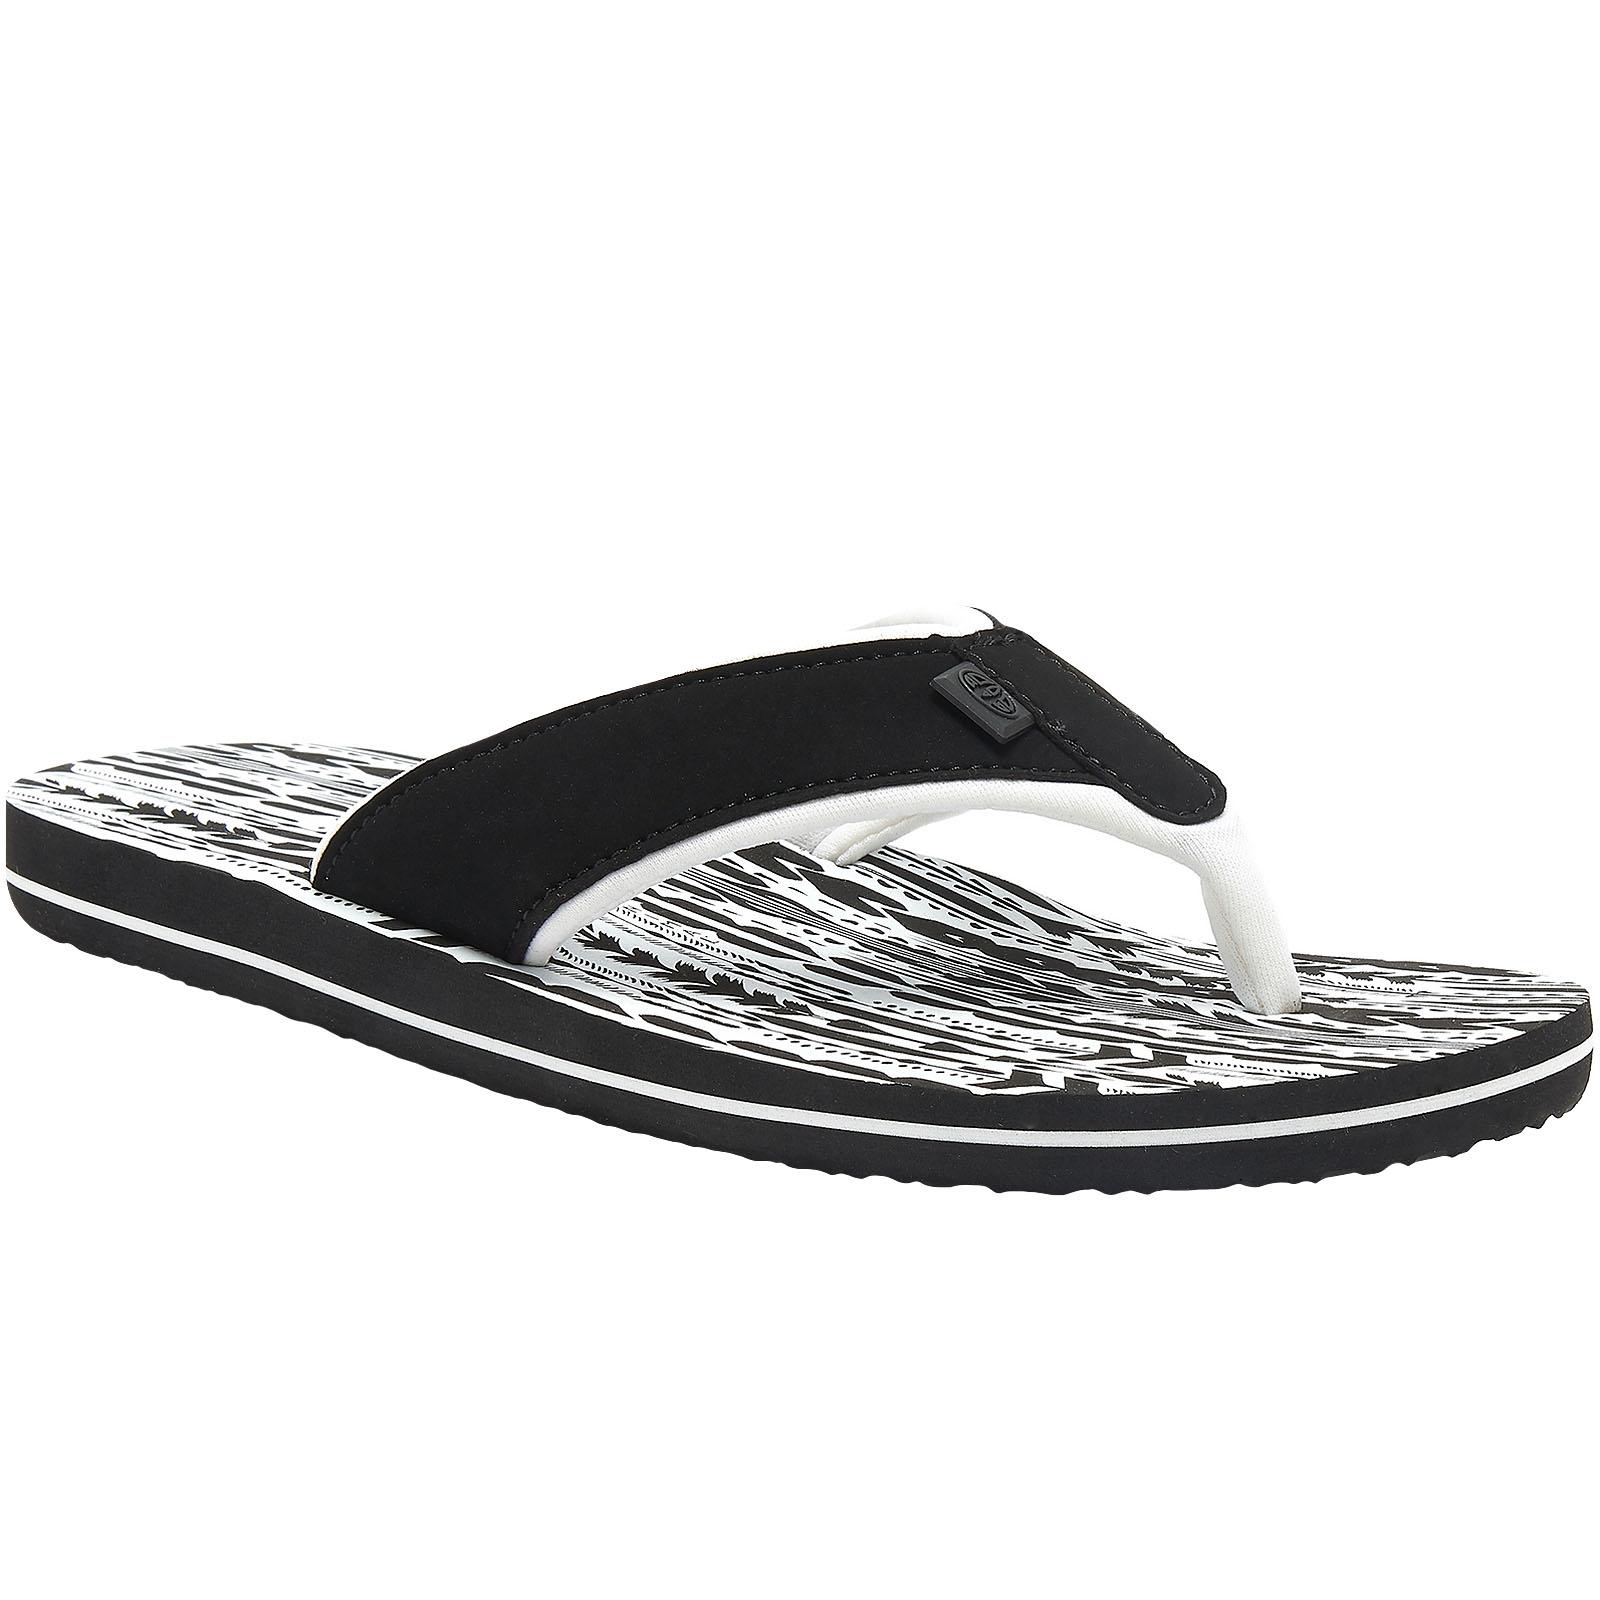 Animal Womens Swish Aop Slip On Beach Holiday Sandals Flip Flops 3 Black